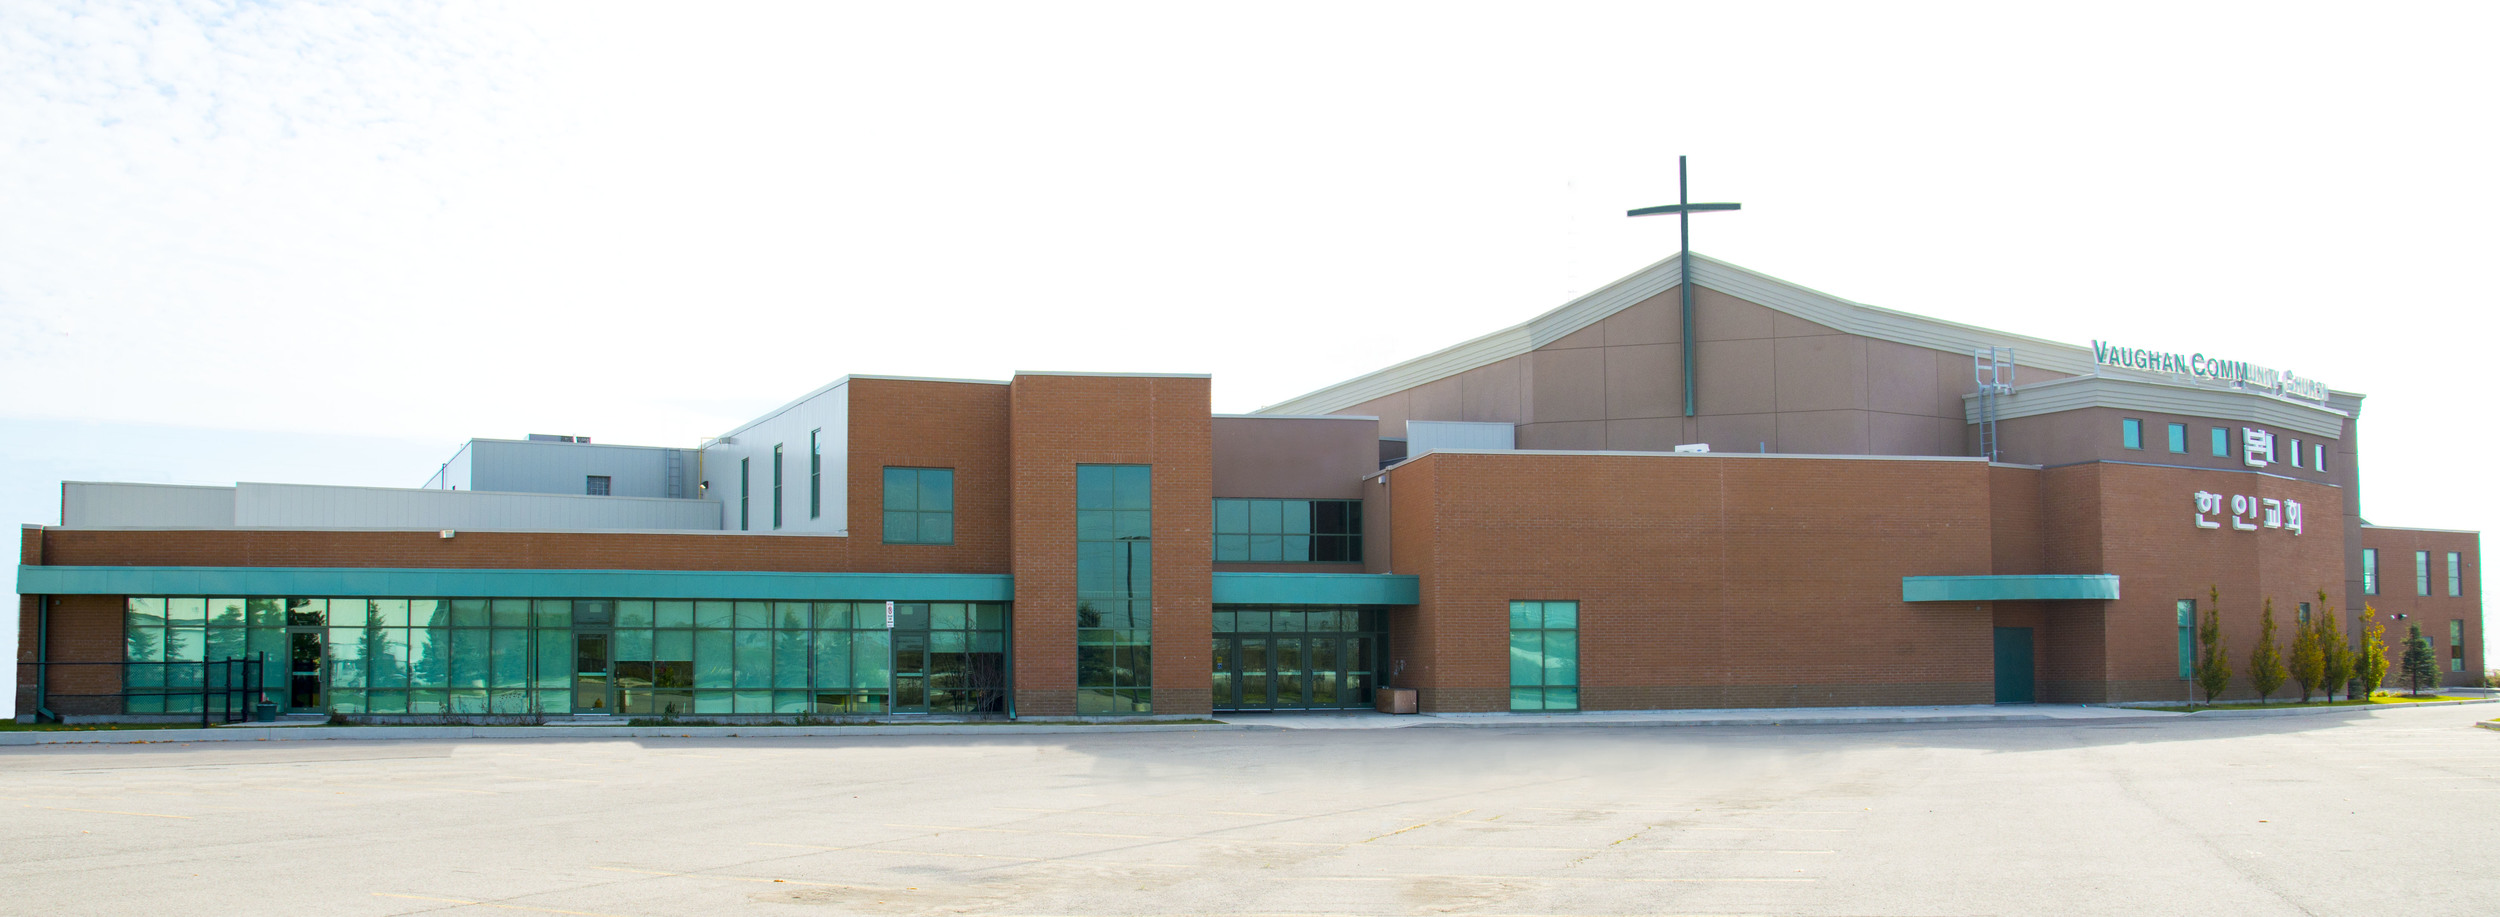 Vaughan Community Church Exterior